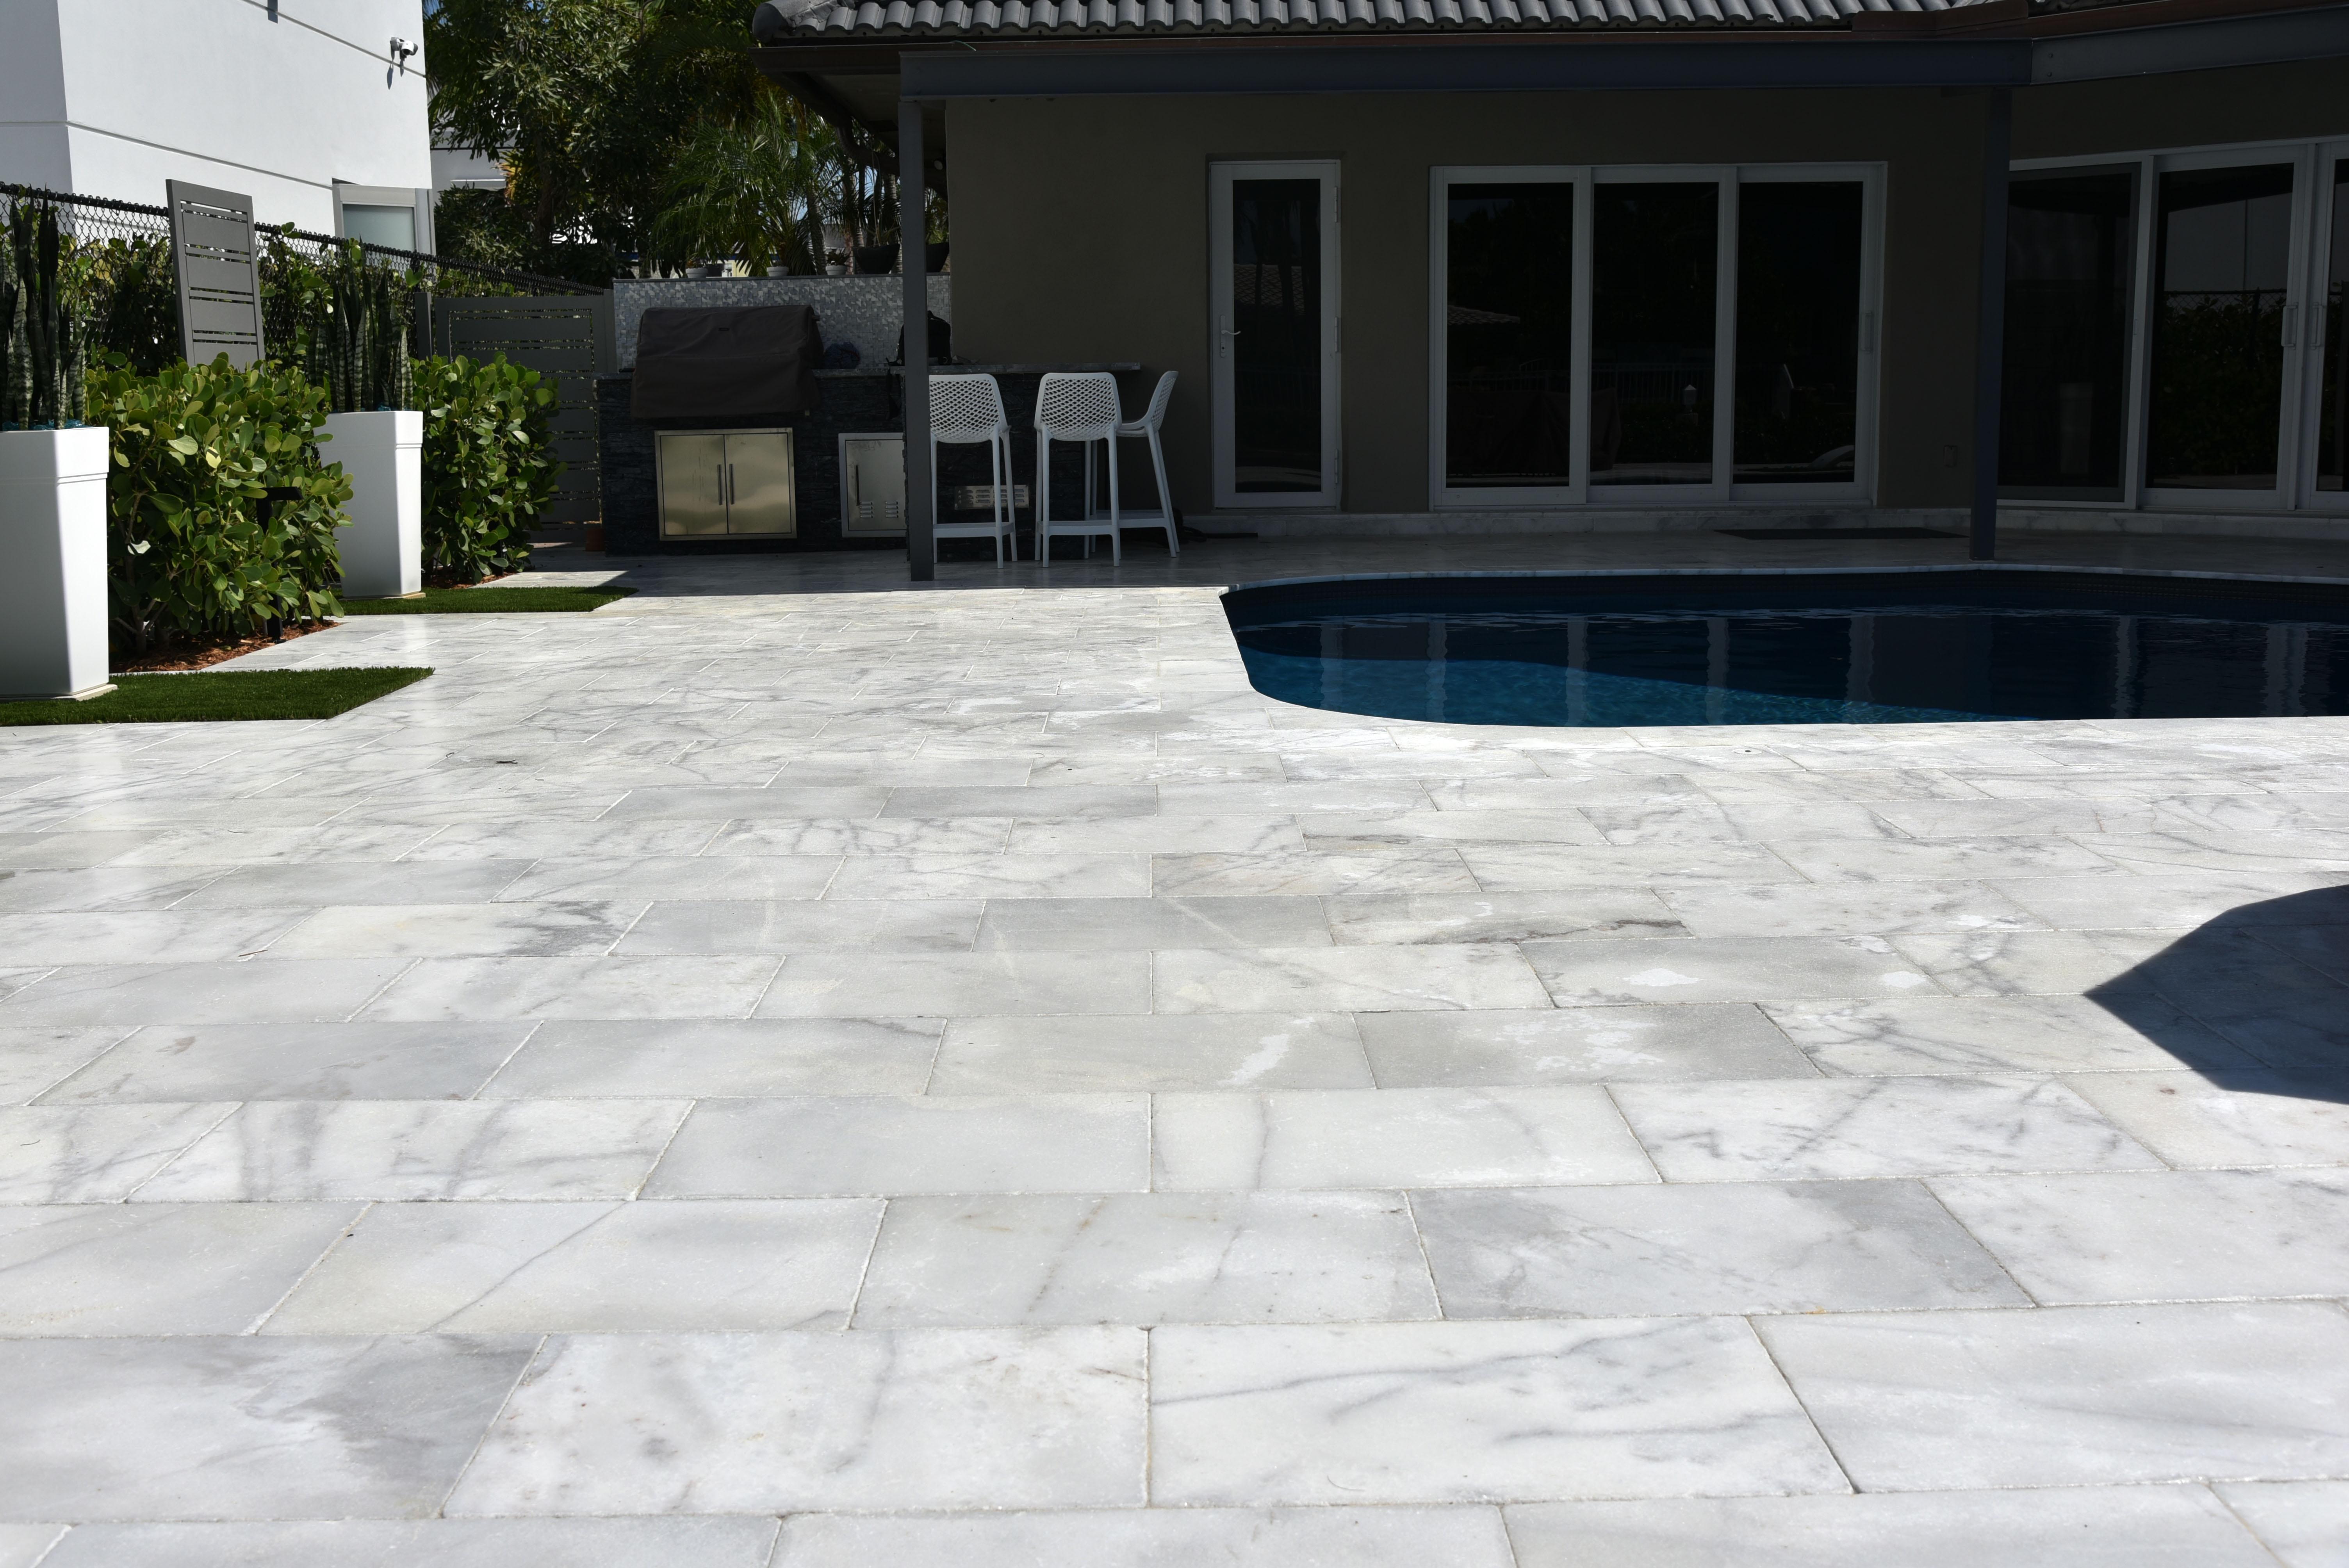 Ice Marble 16x24 Deck